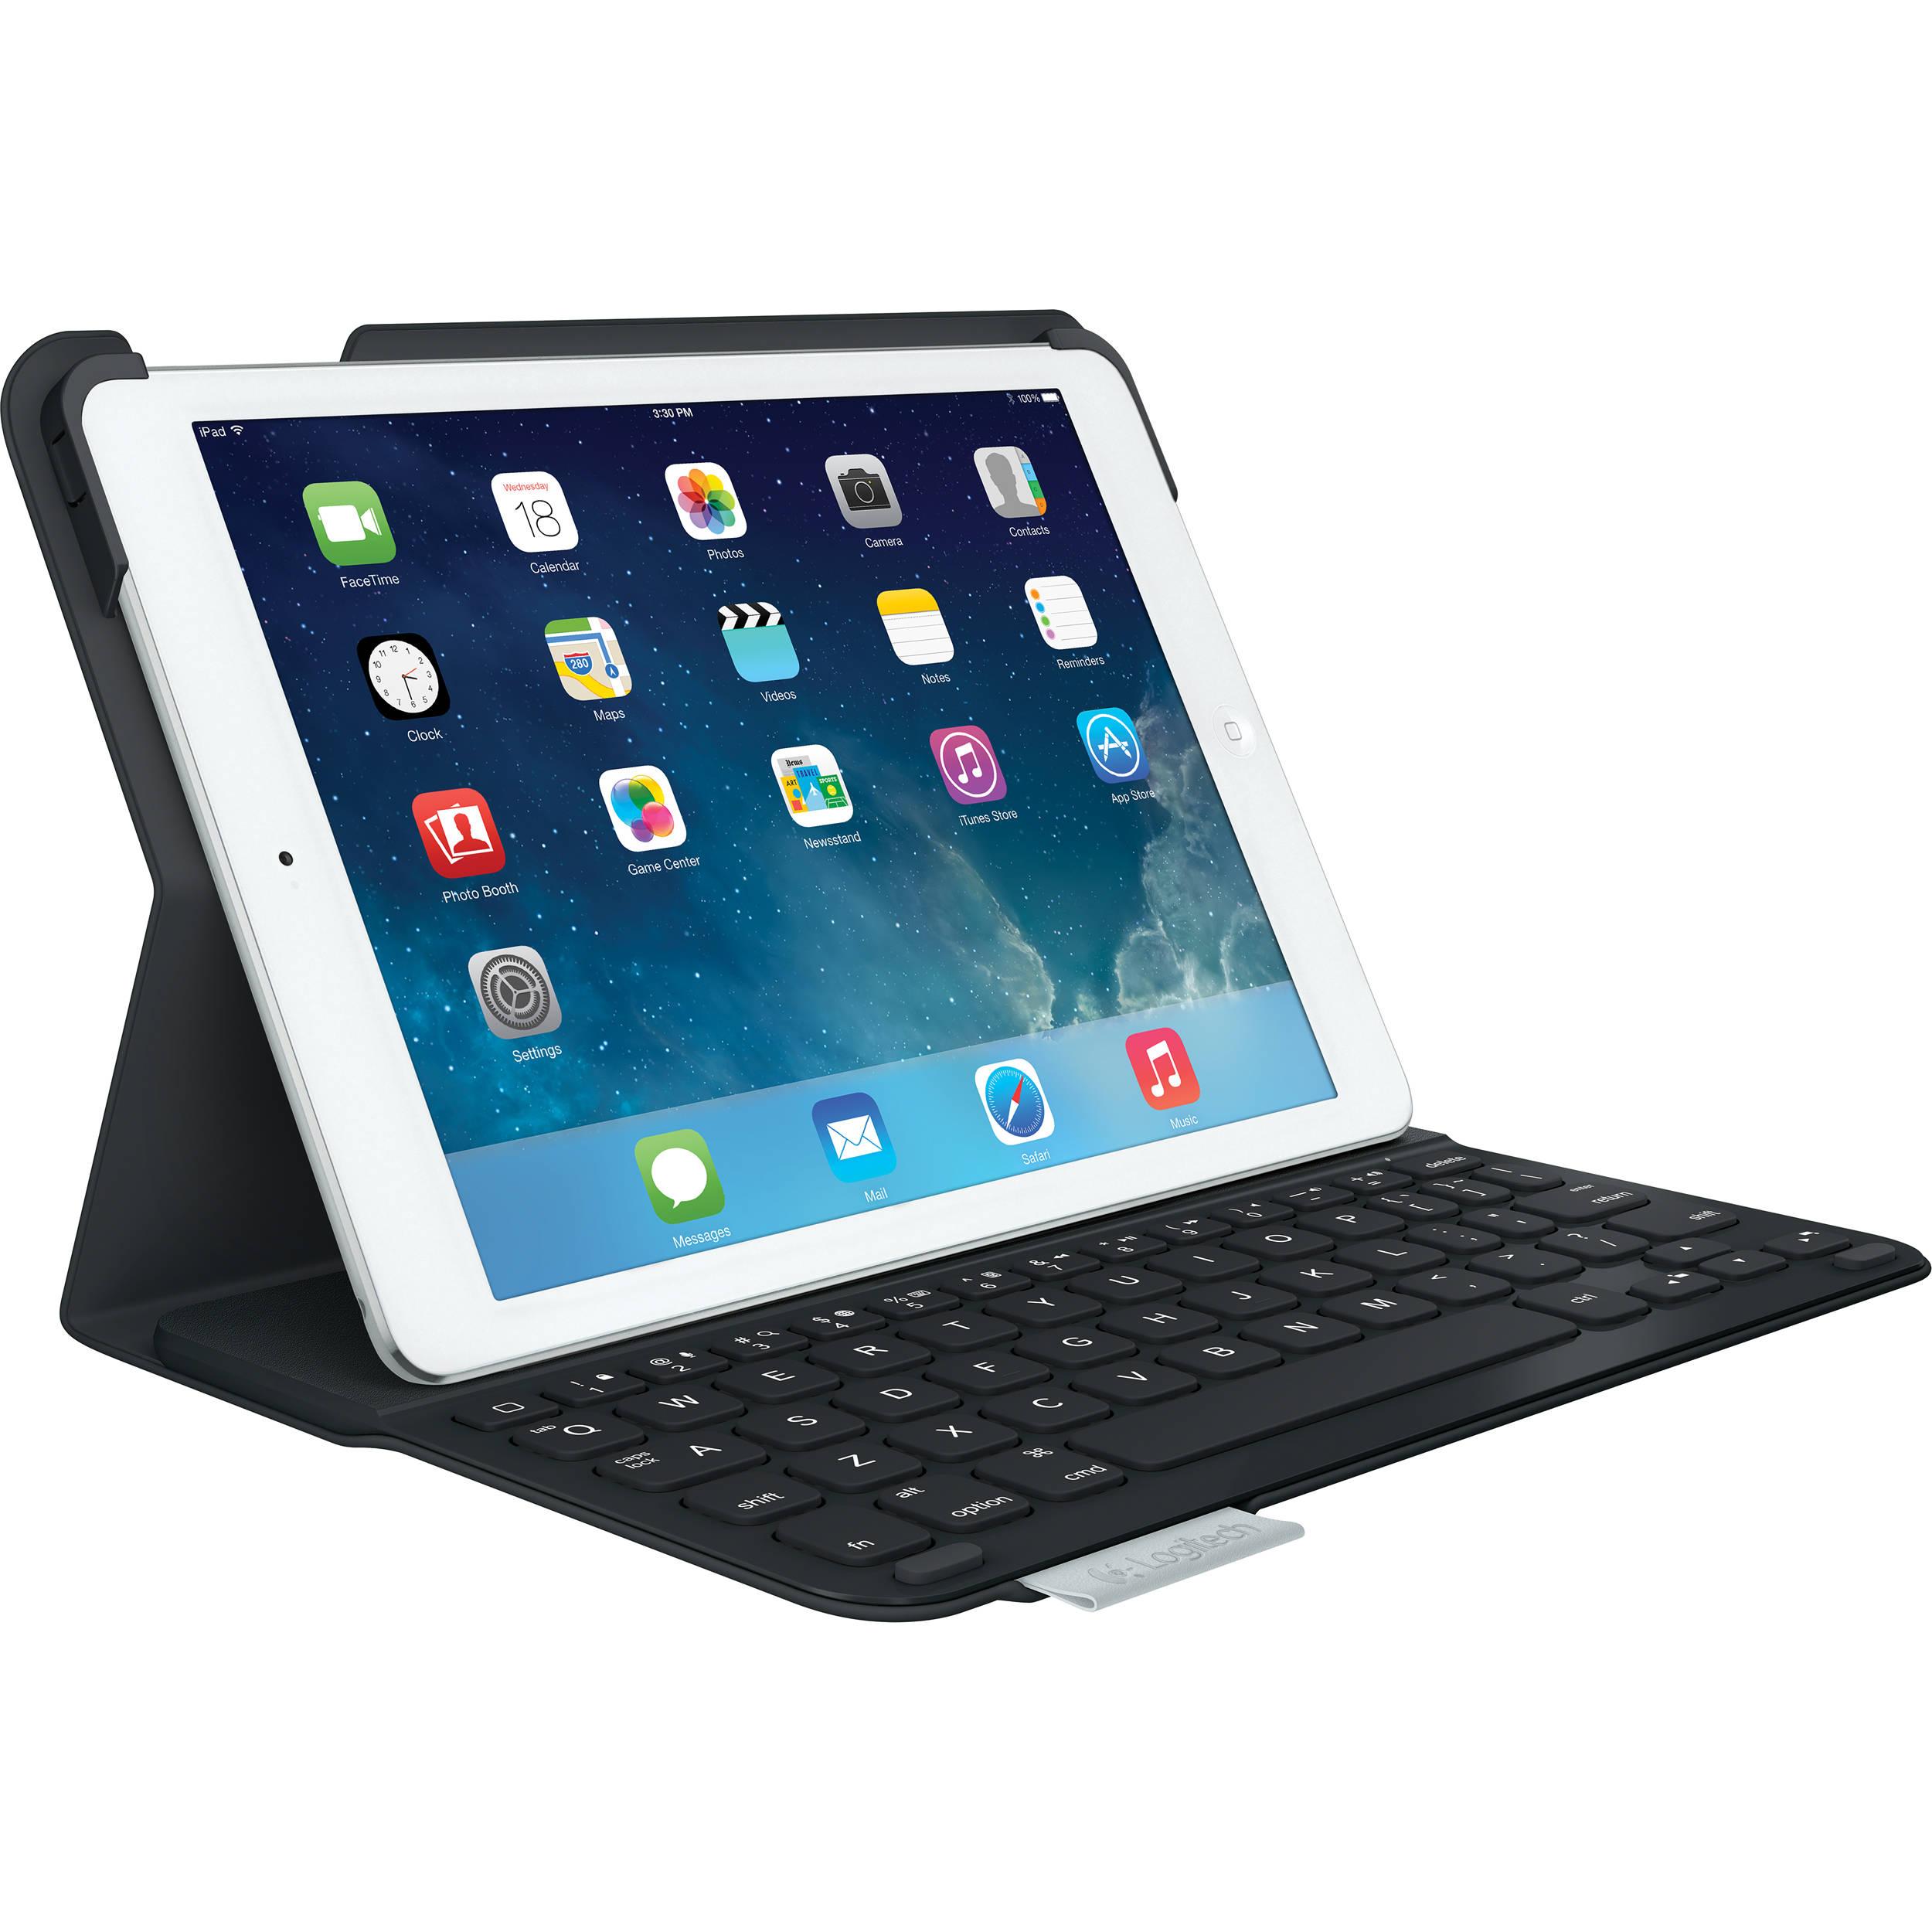 Logitech Ultrathin Keyboard Cover For IPad Air 920 005905 BampH